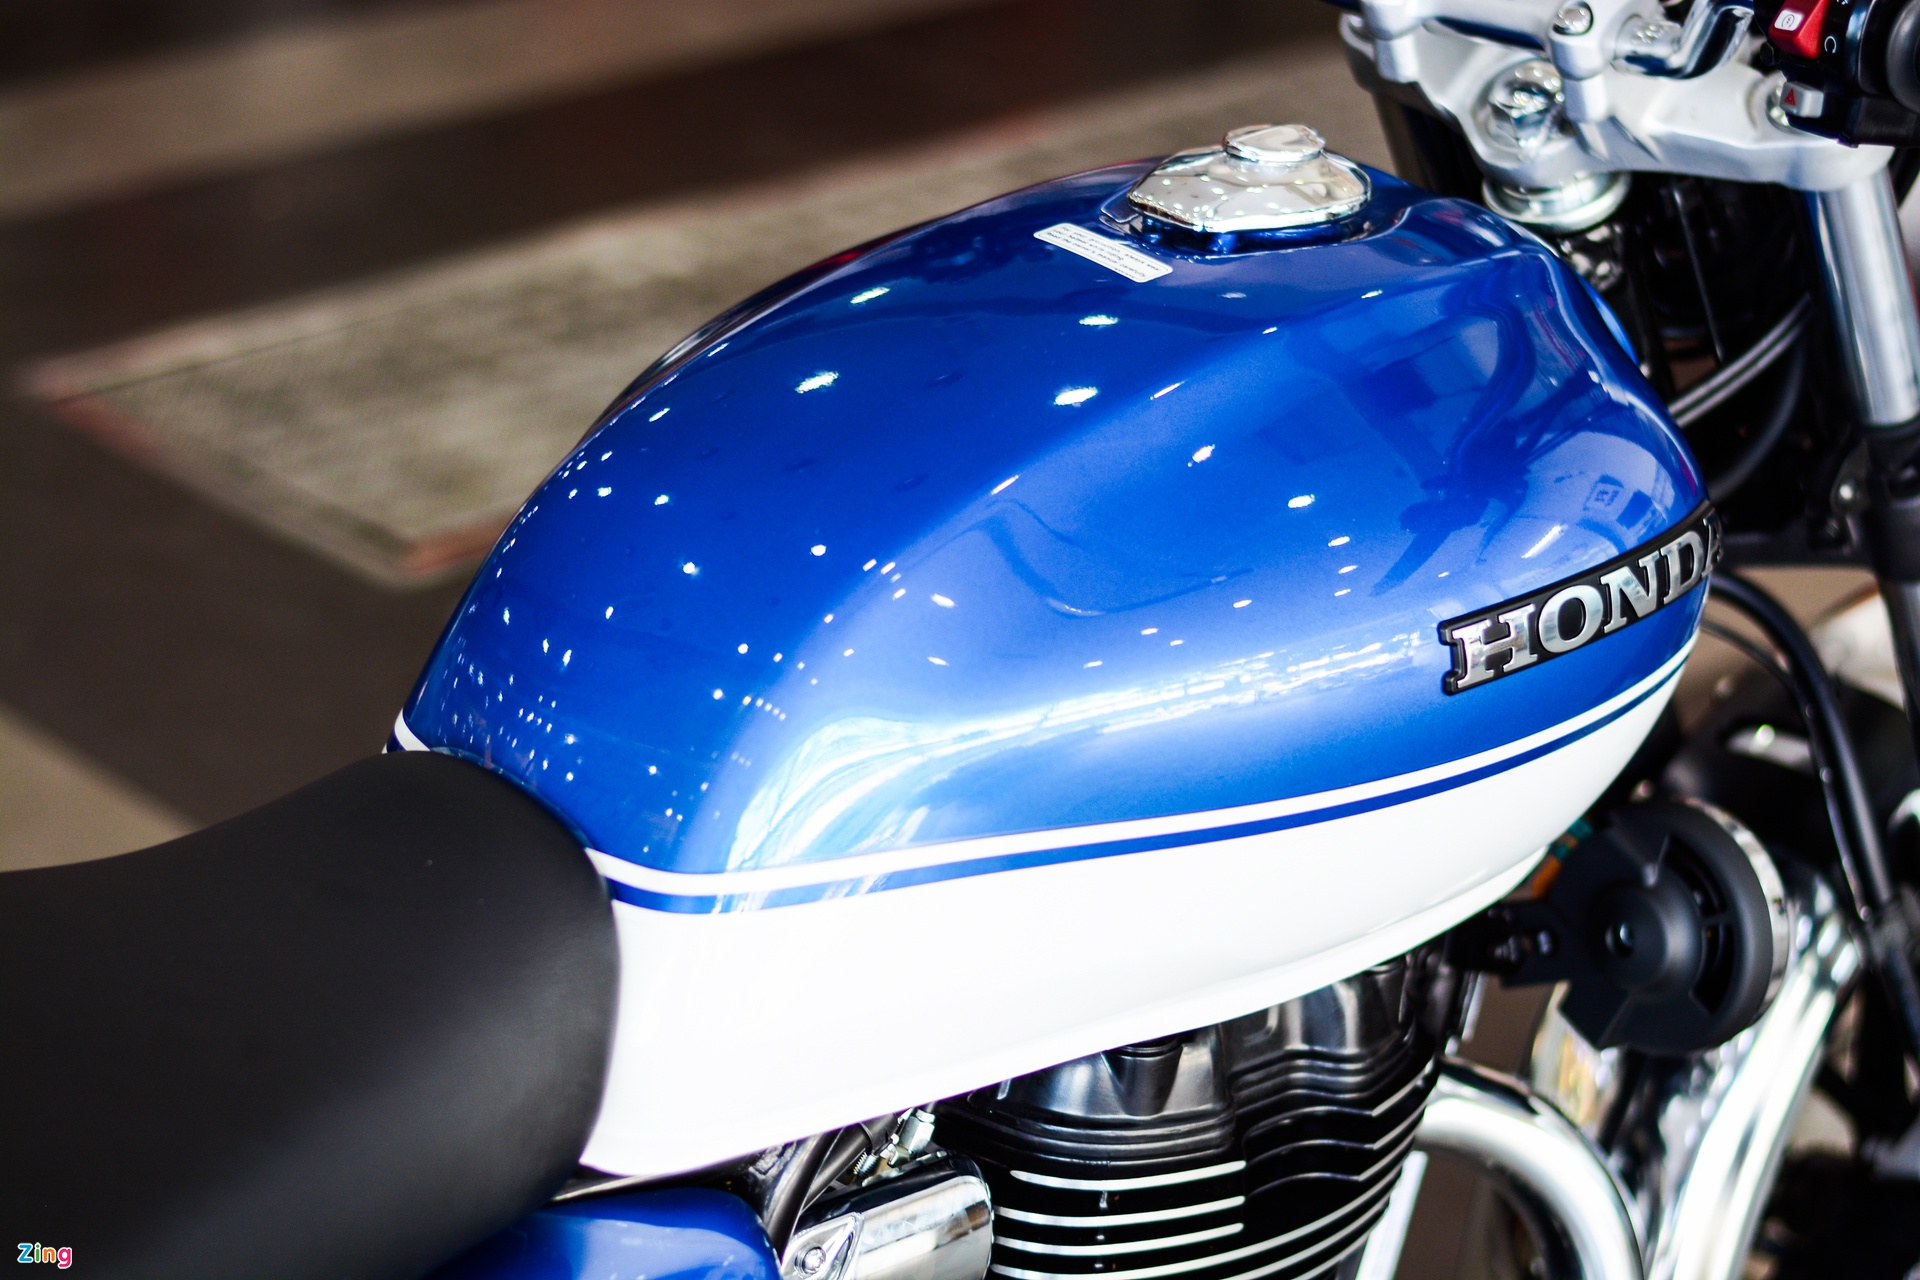 Honda H'ness CB350 DLX Pro xuat hien tai Viet Nam anh 8